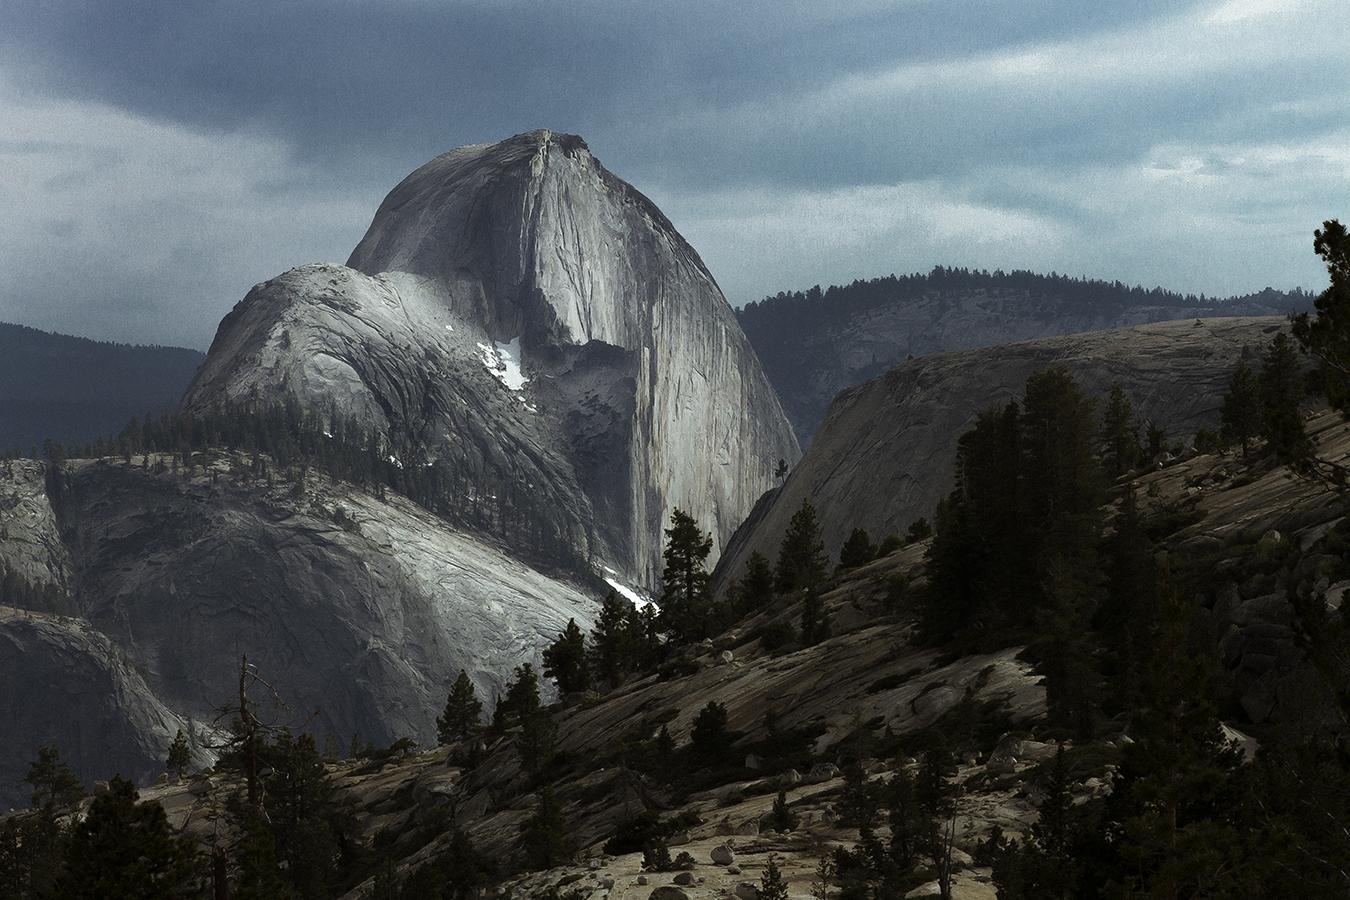 Half-Dome, 2016  Yosemite National Park, California, United States  140mm f/18 1/125 sec ISO 200